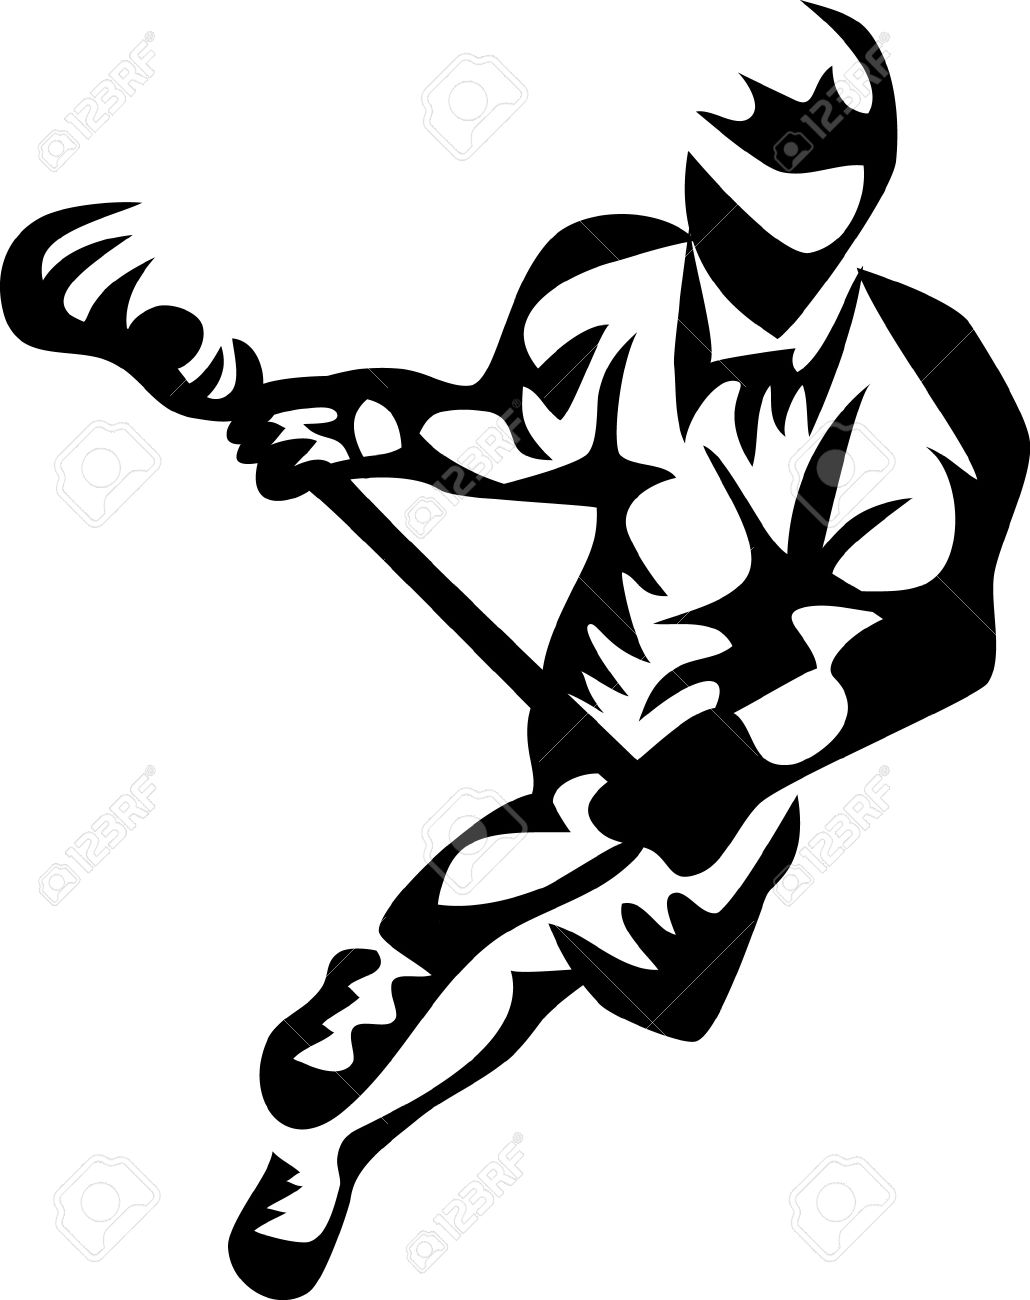 1030x1300 Canada clipart lacrosse